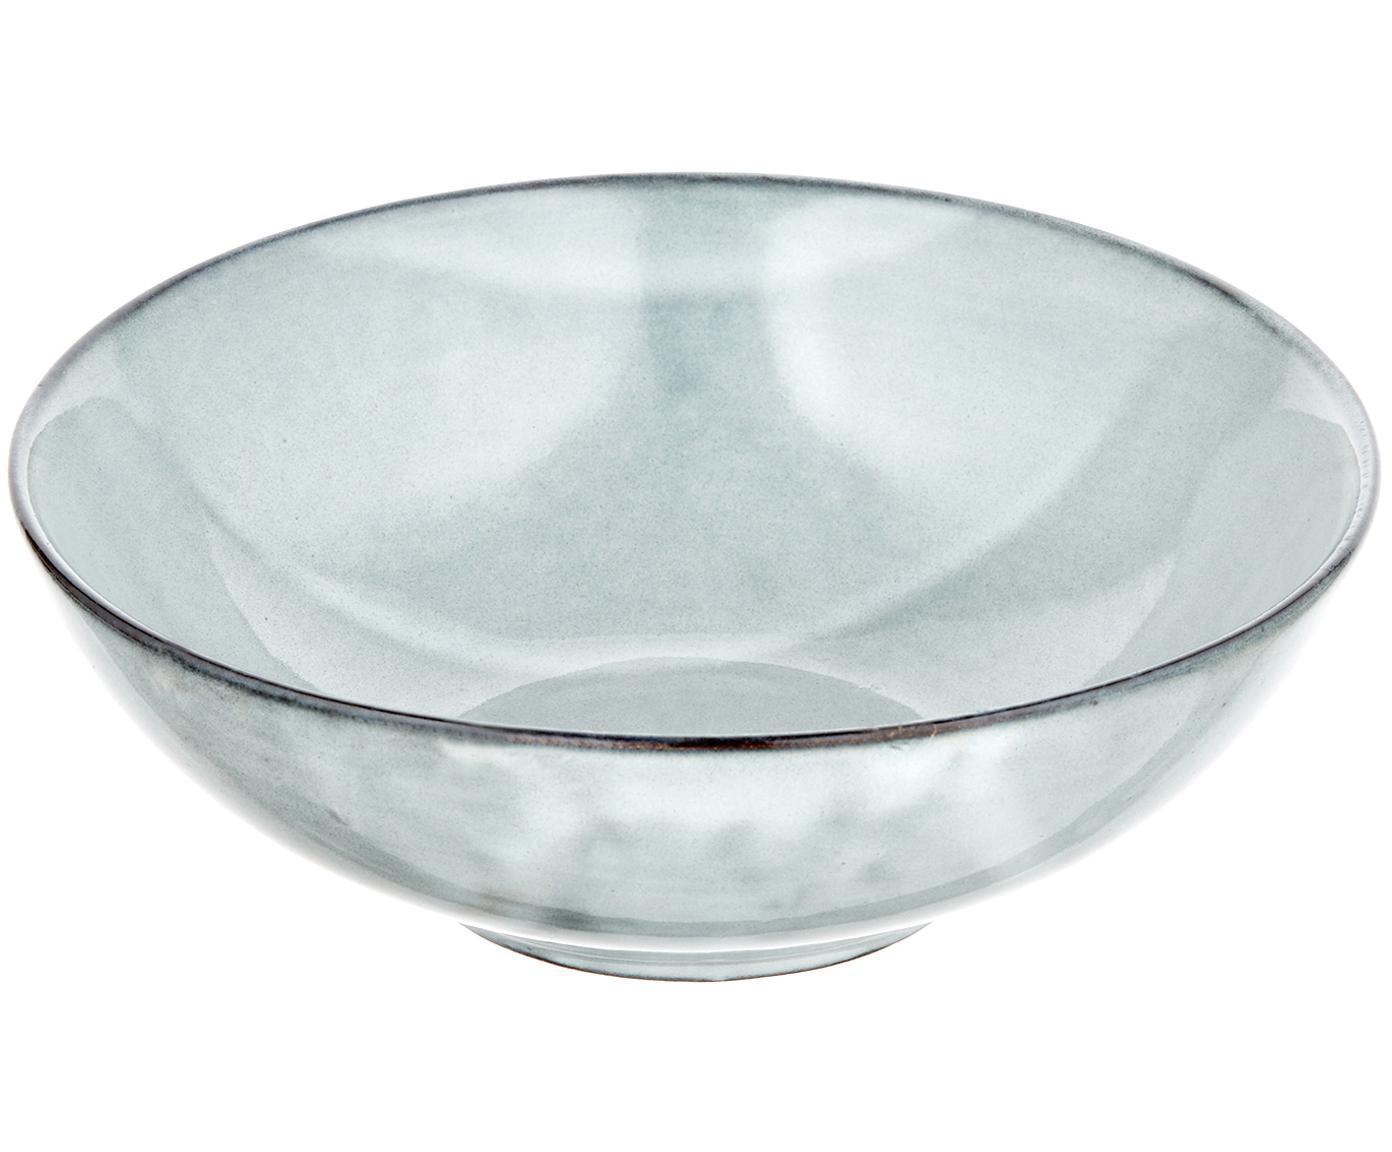 Handgemachte Suppenteller Thalia in Blaugrau, 2 Stück, Steinzeug, Blaugrau, Ø 18 x H 6 cm